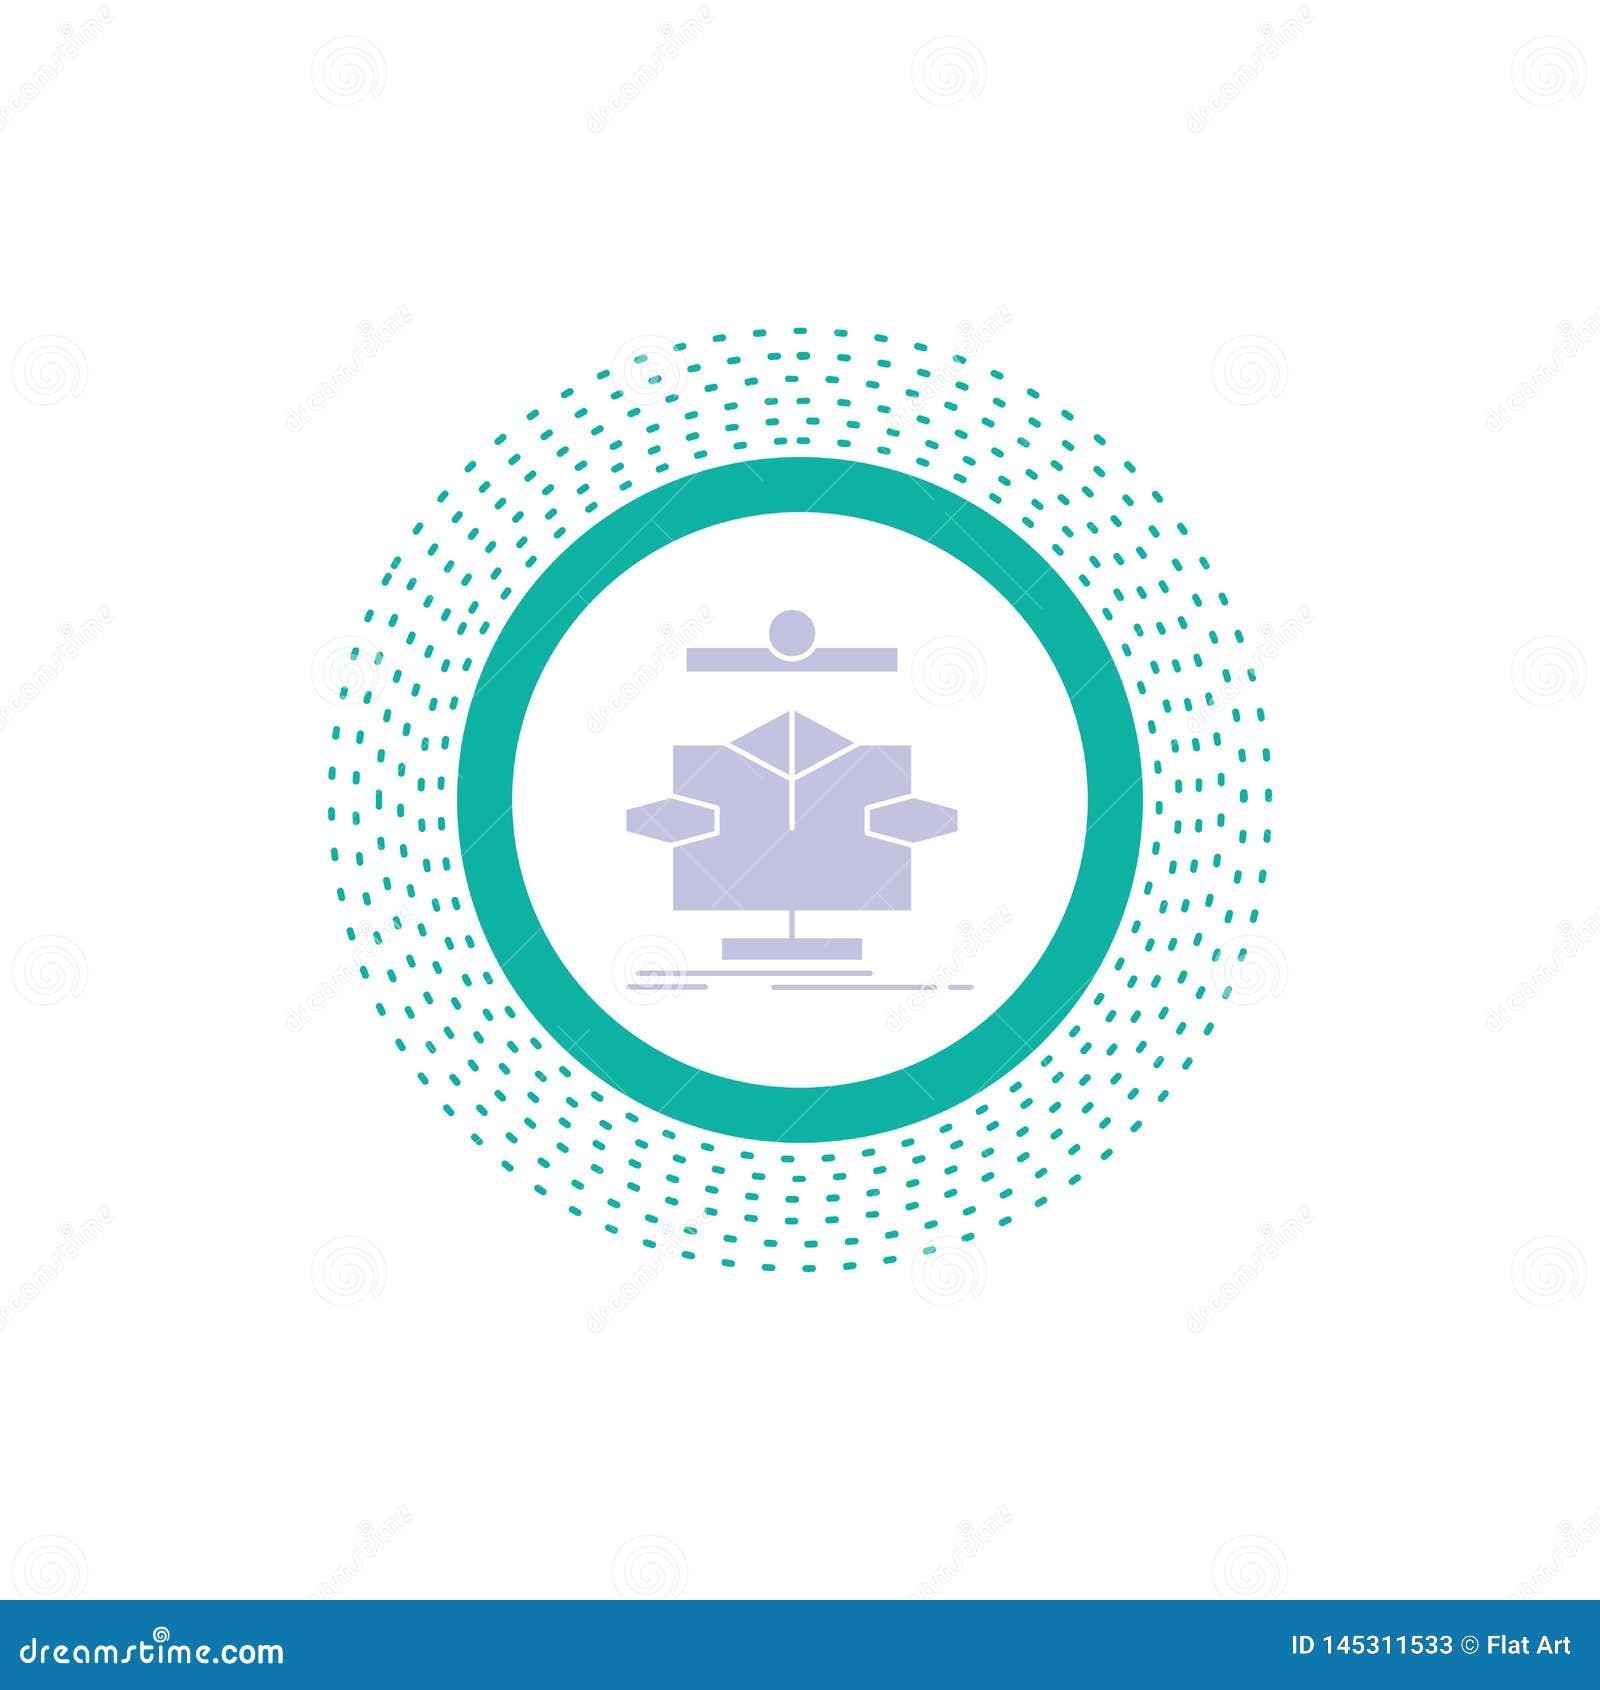 Algorithm, chart, data, diagram, flow Glyph Icon. Vector isolated illustration